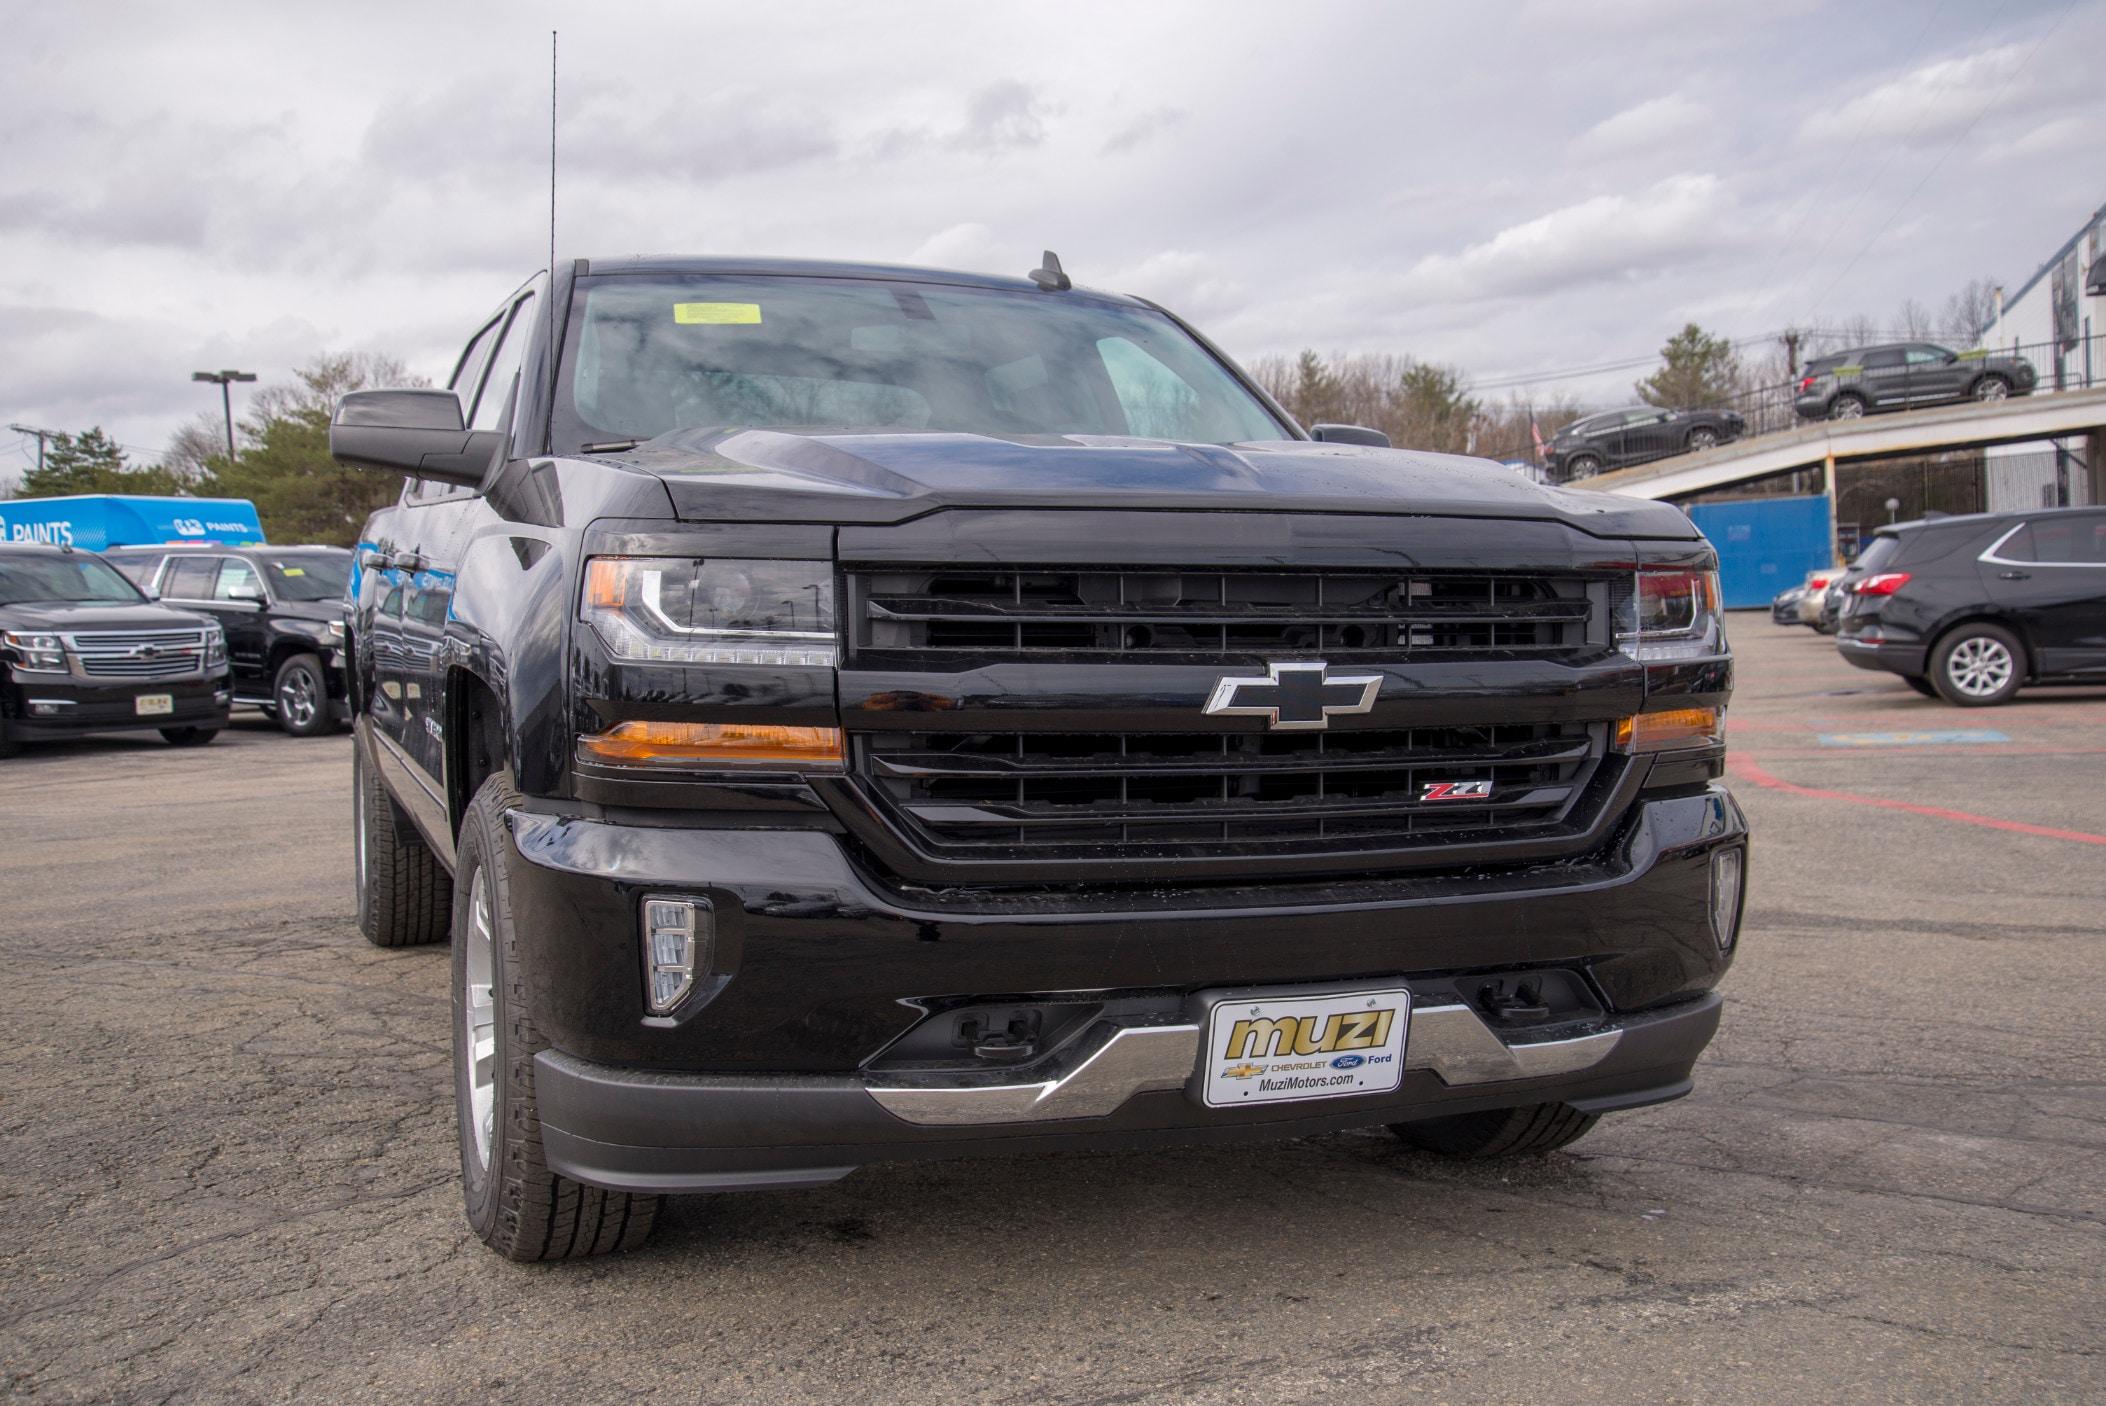 New Chevy Truck Deals